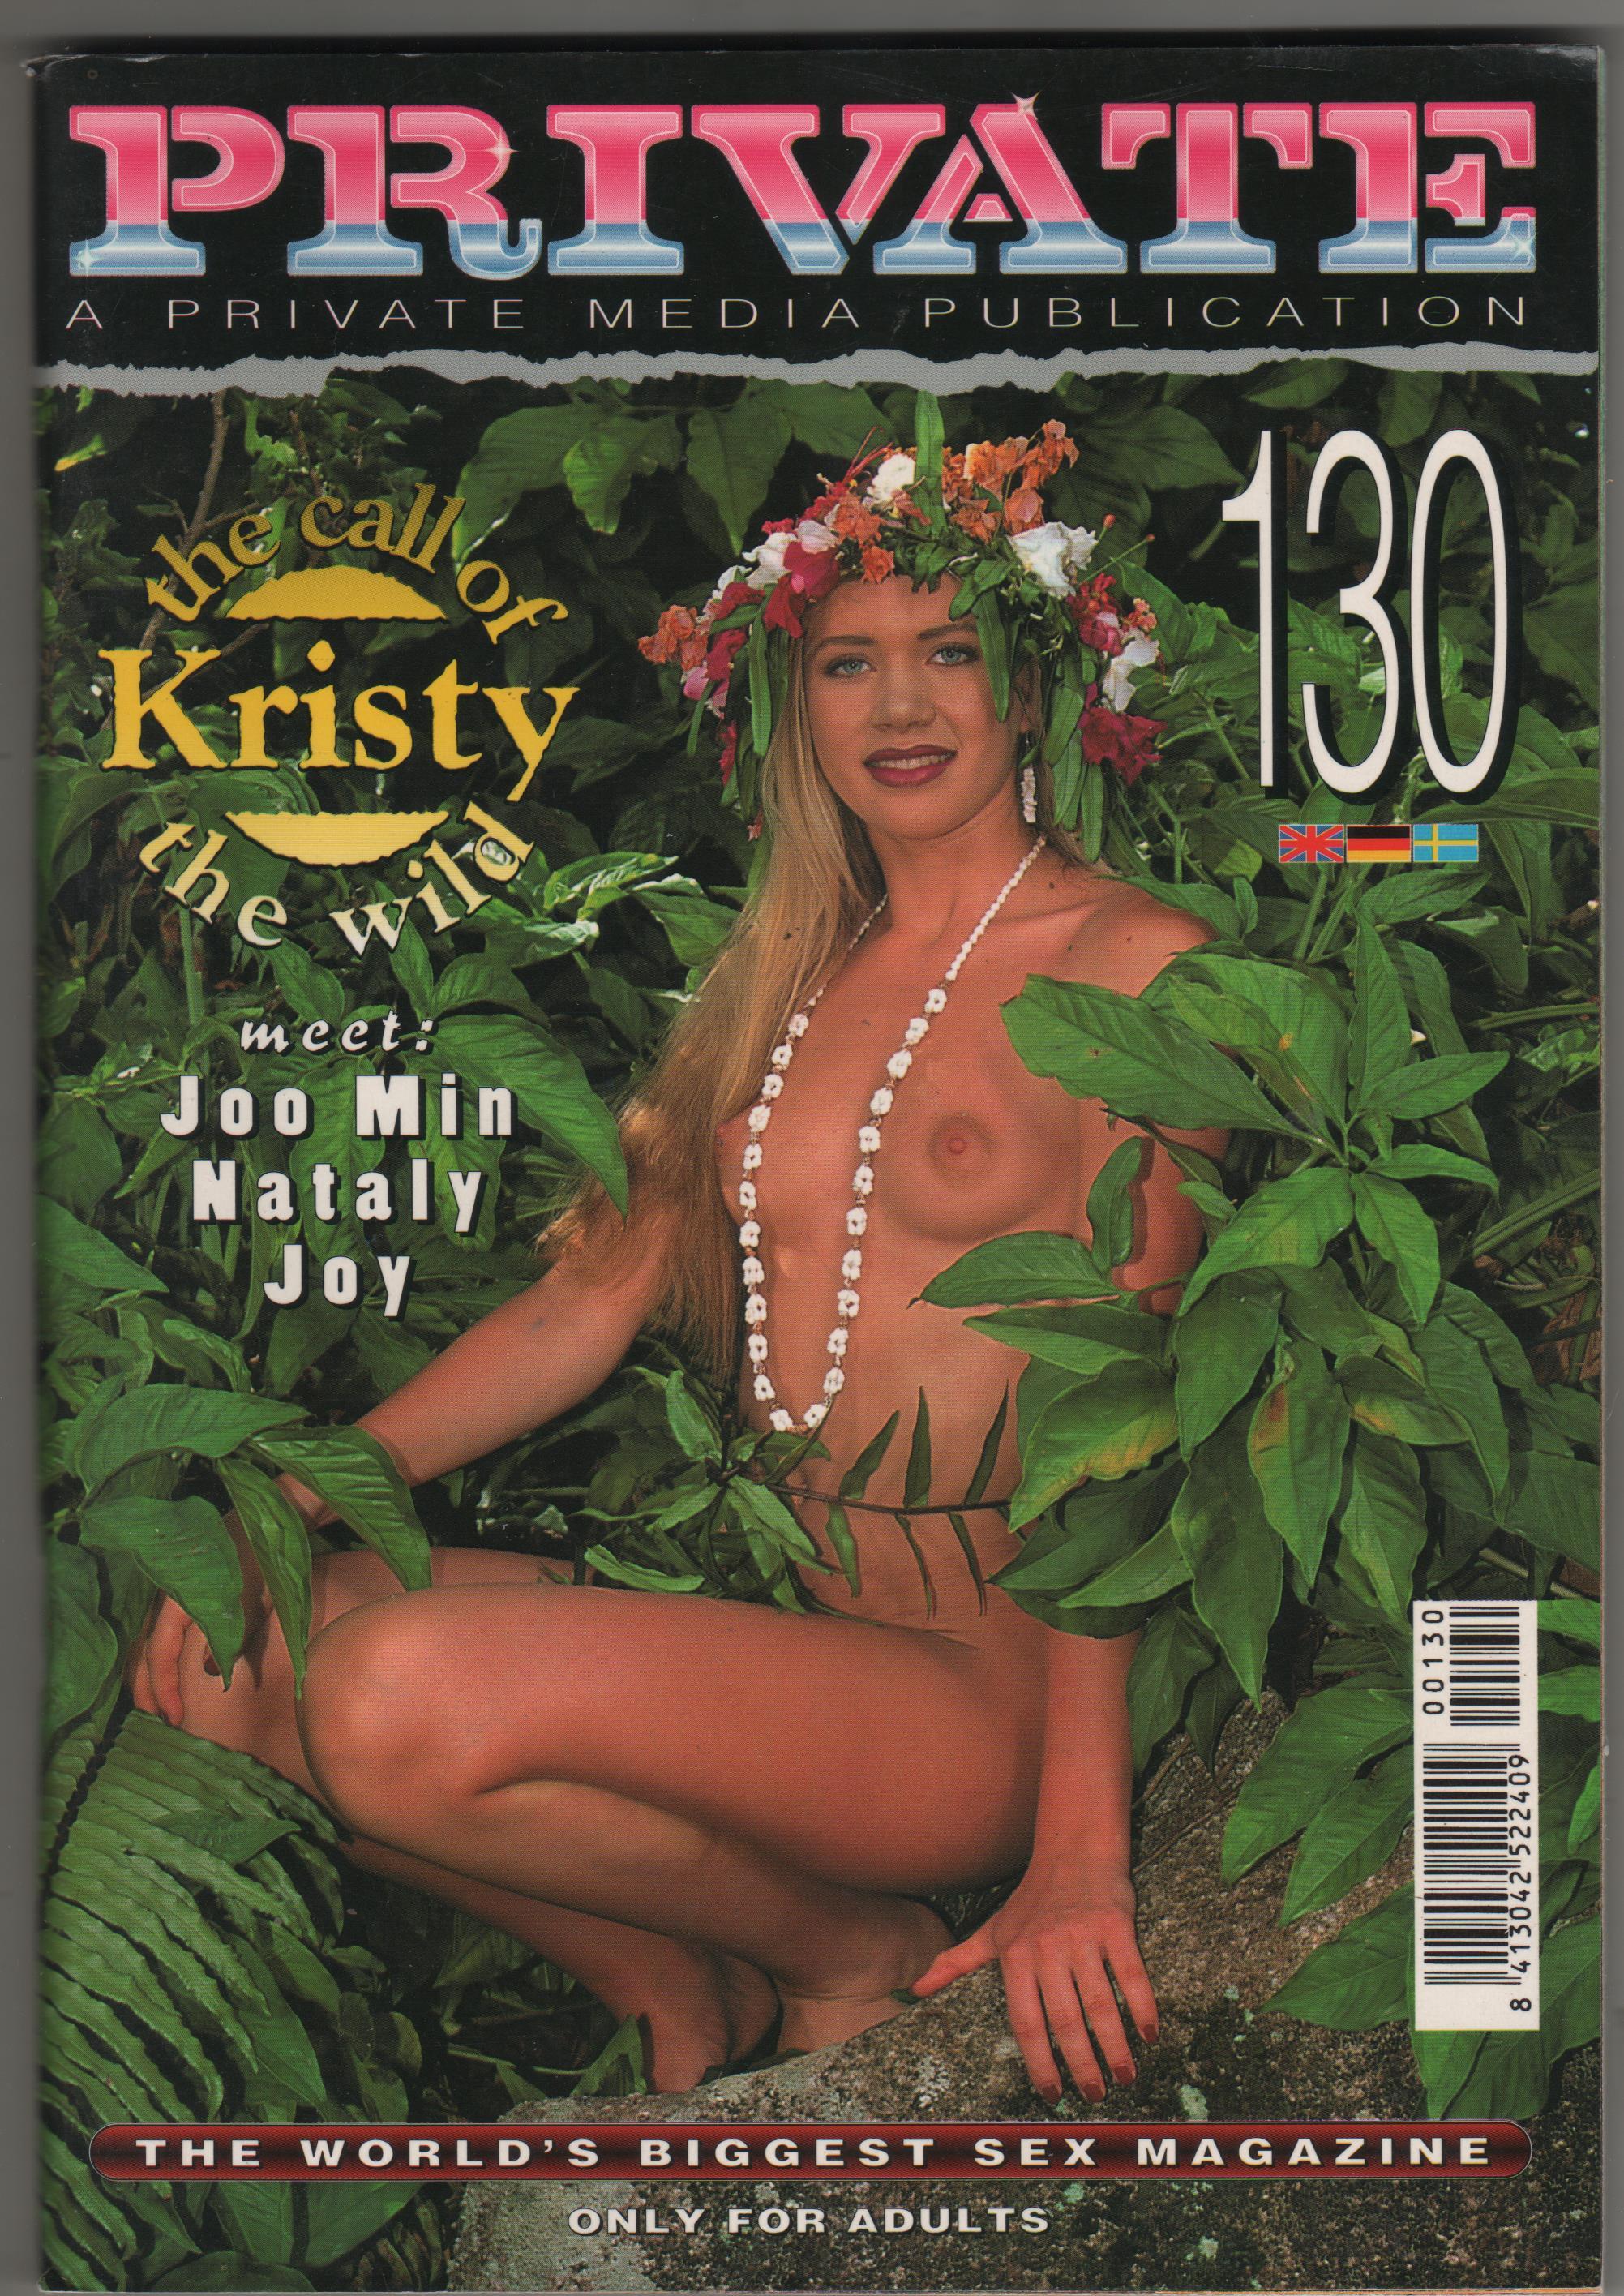 PRIVATE MAGAZINE N.130 kristy lion anita blond joy kiss nataly